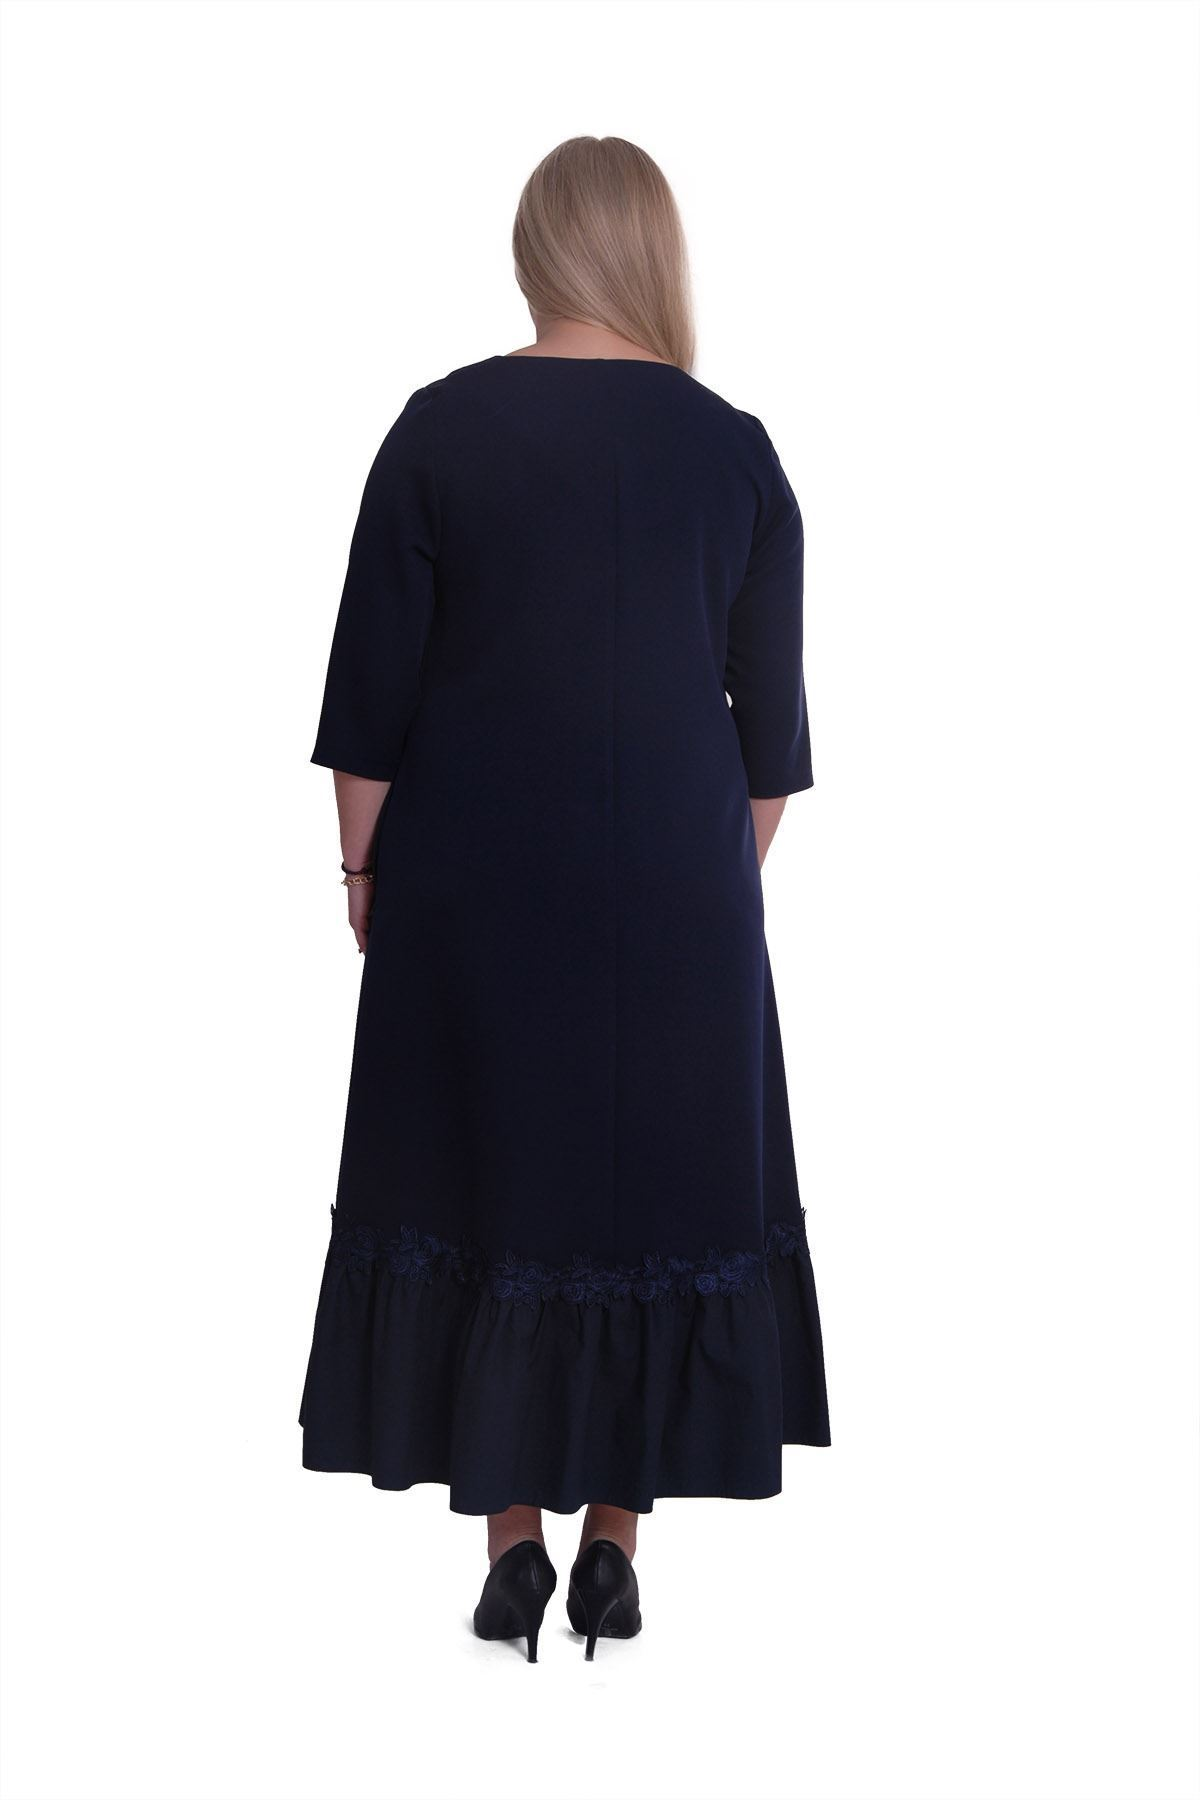 Lacivert Cepli Elbise H8-0427